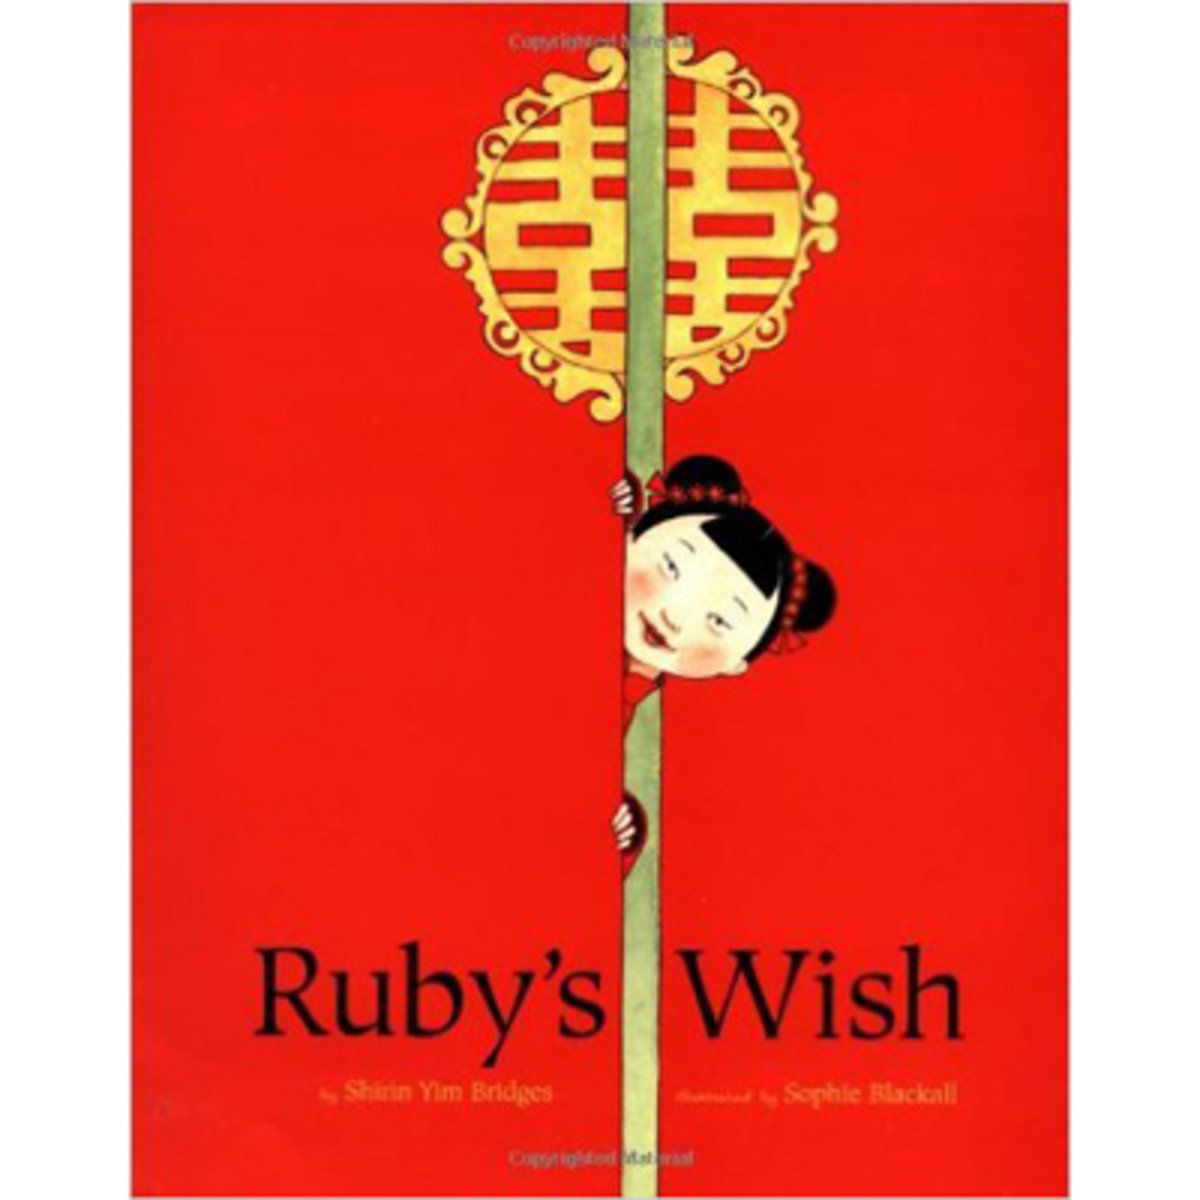 RUBY'S WISH 9780811834902